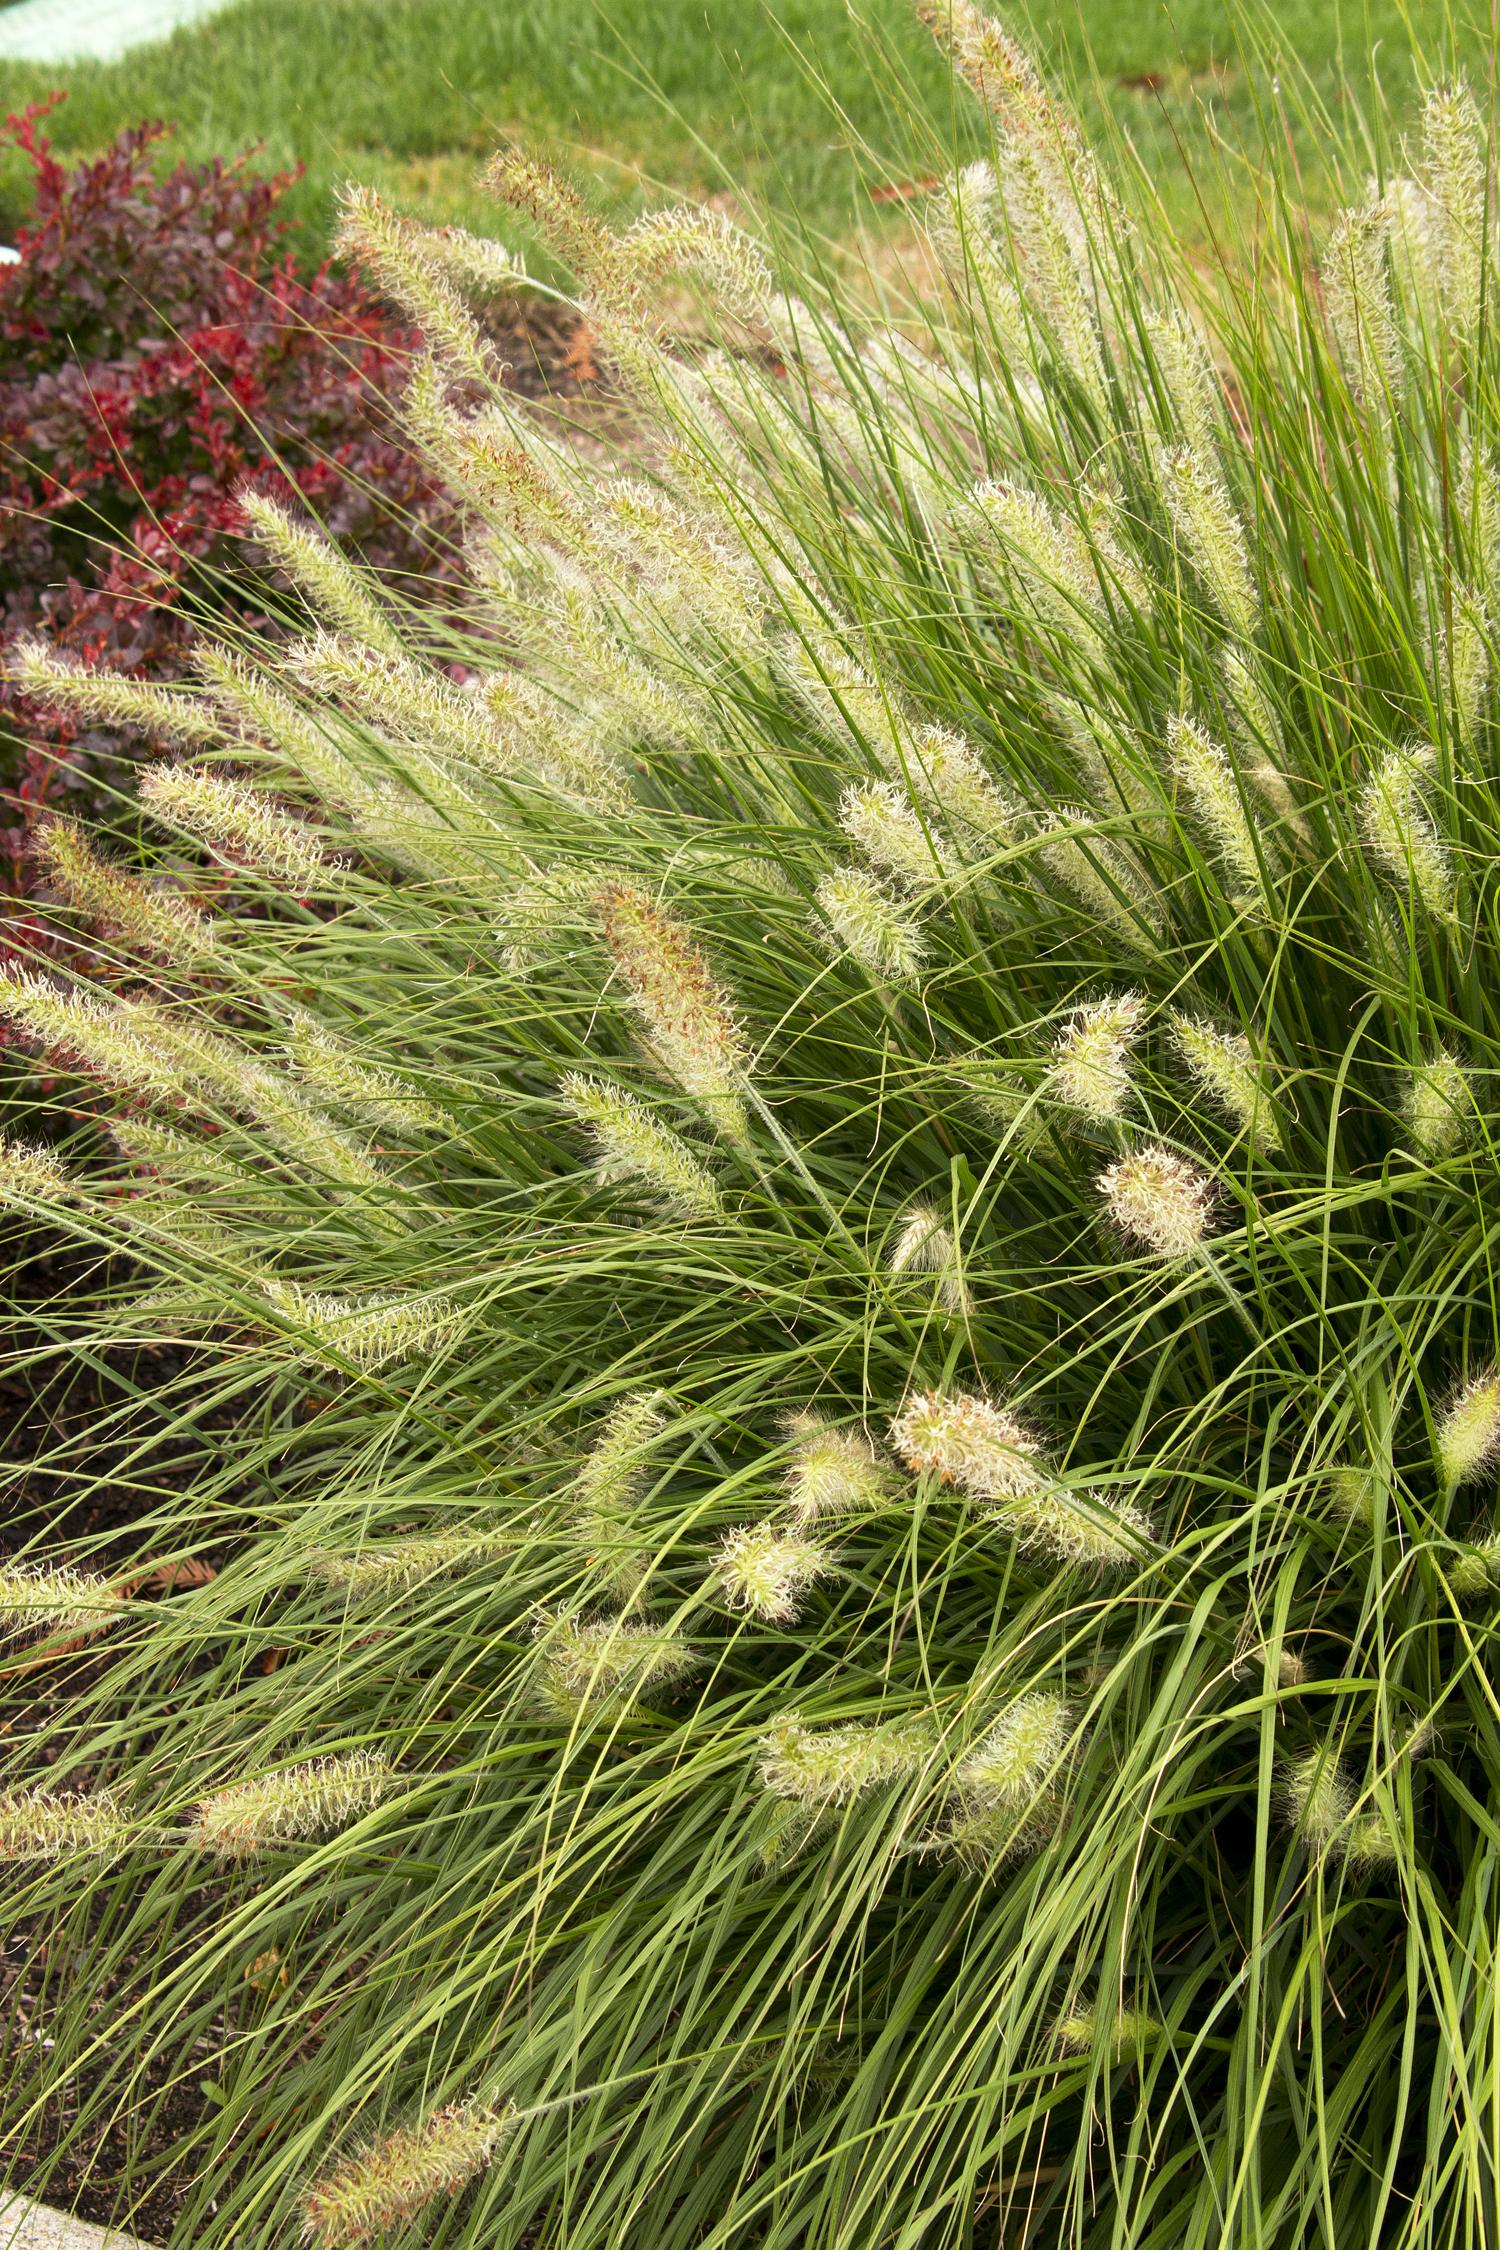 Dwarf Fountain Grass Monrovia Dwarf Fountain Grass